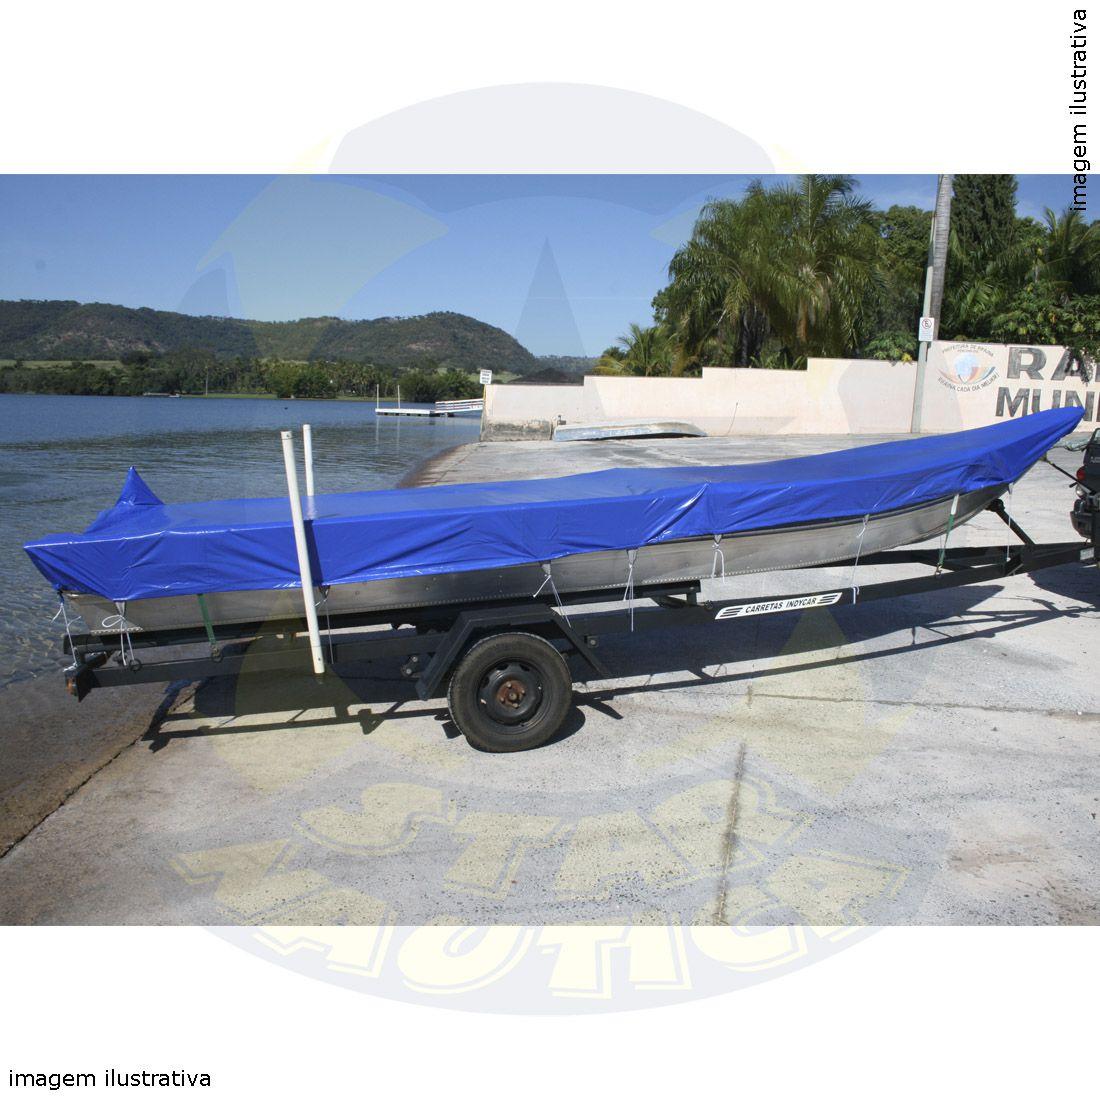 Capa Lona de Cobertura Barco Squalus 500 Lona Vinílica